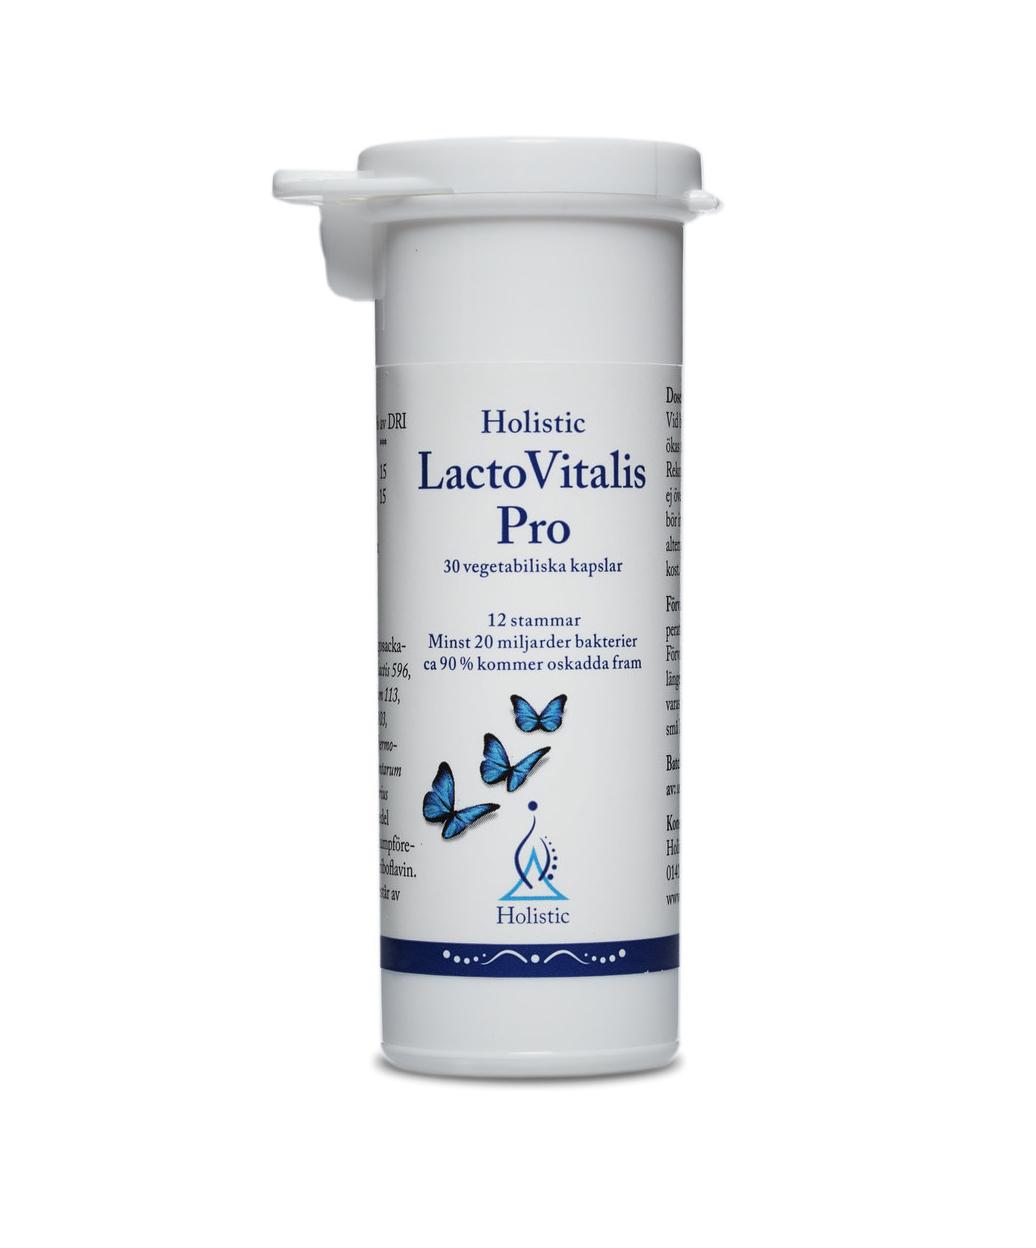 LactoVitalis Pro